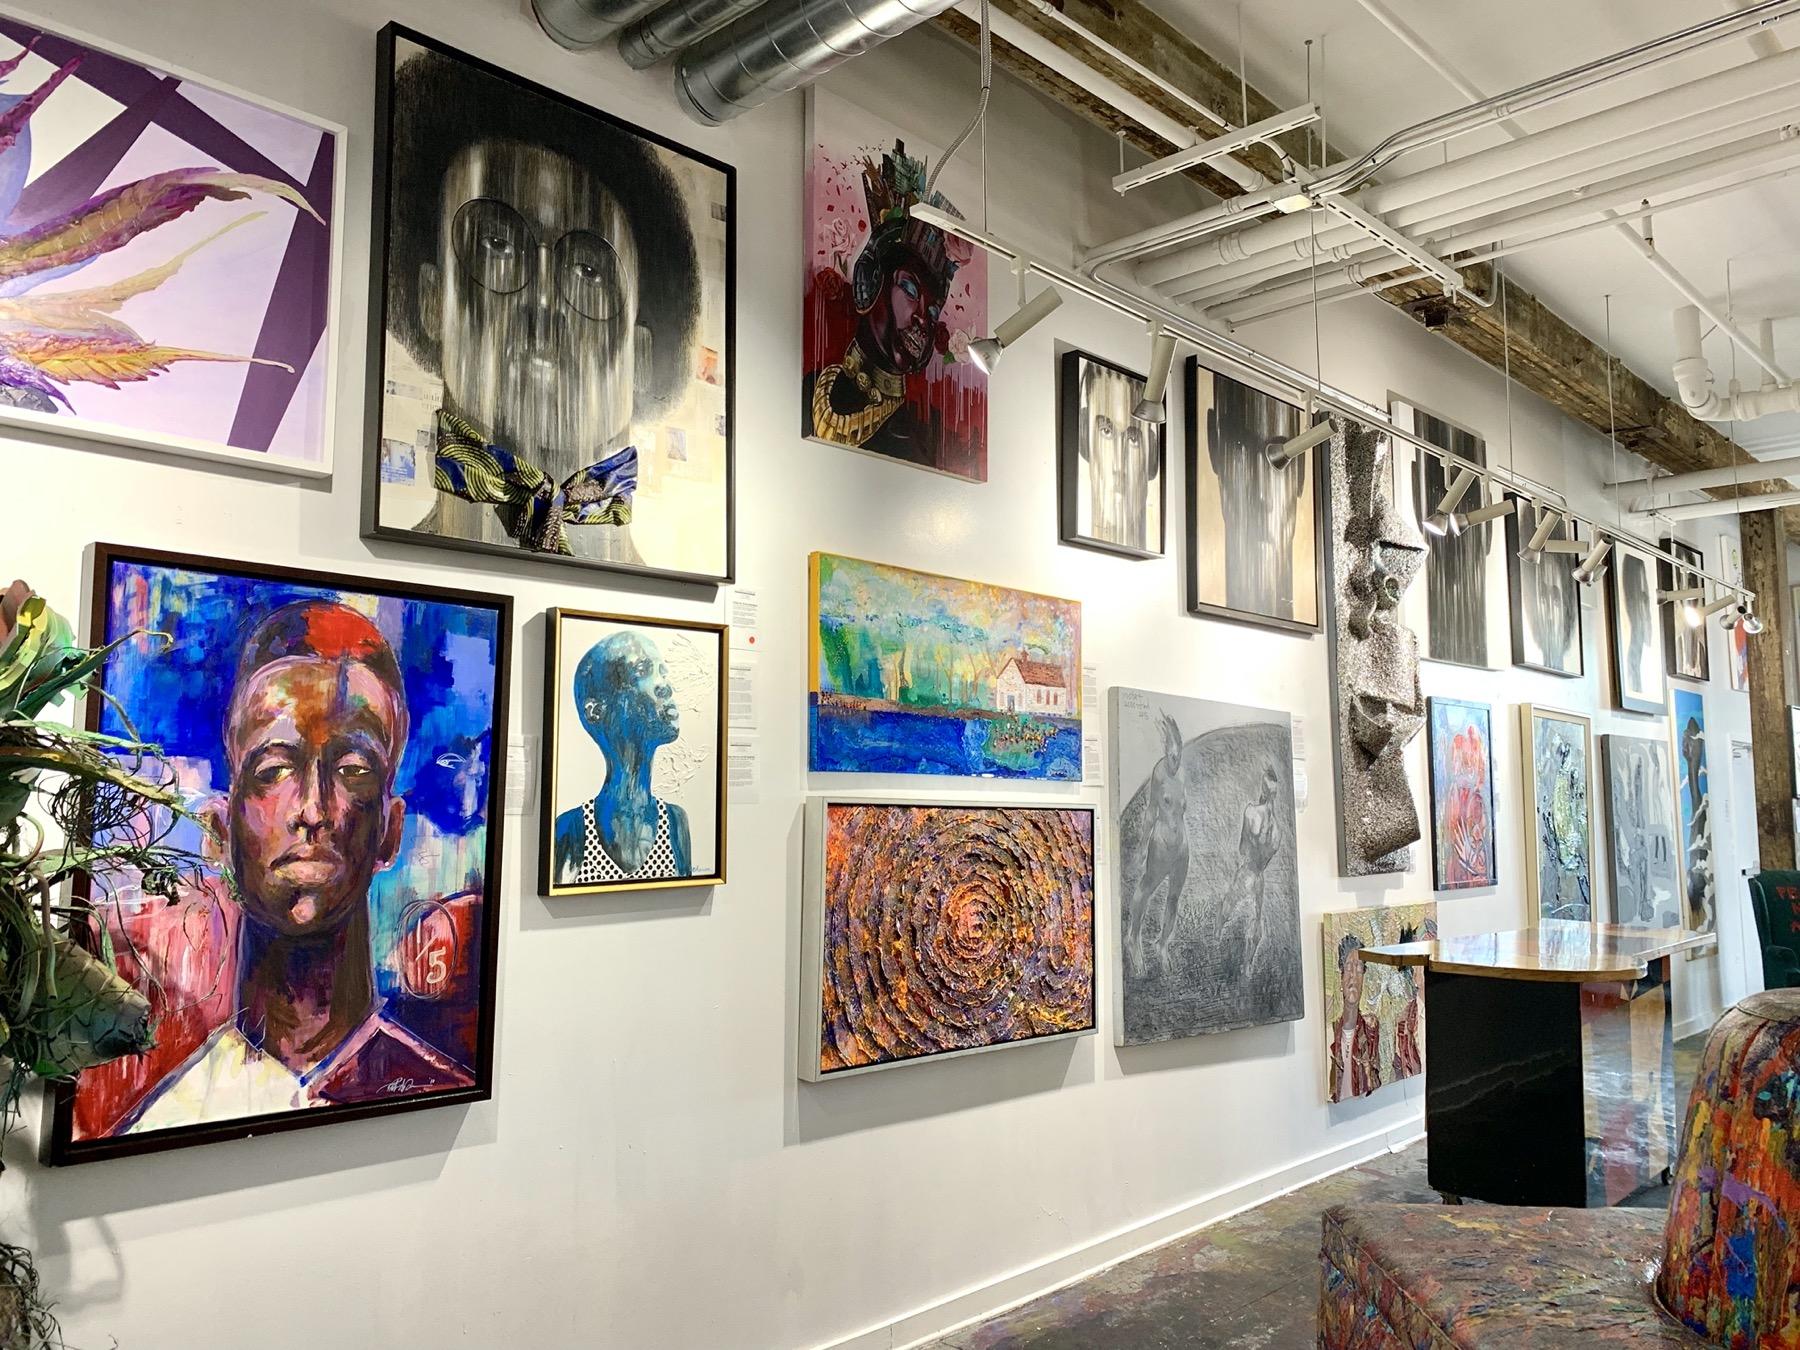 Gallery Guichard